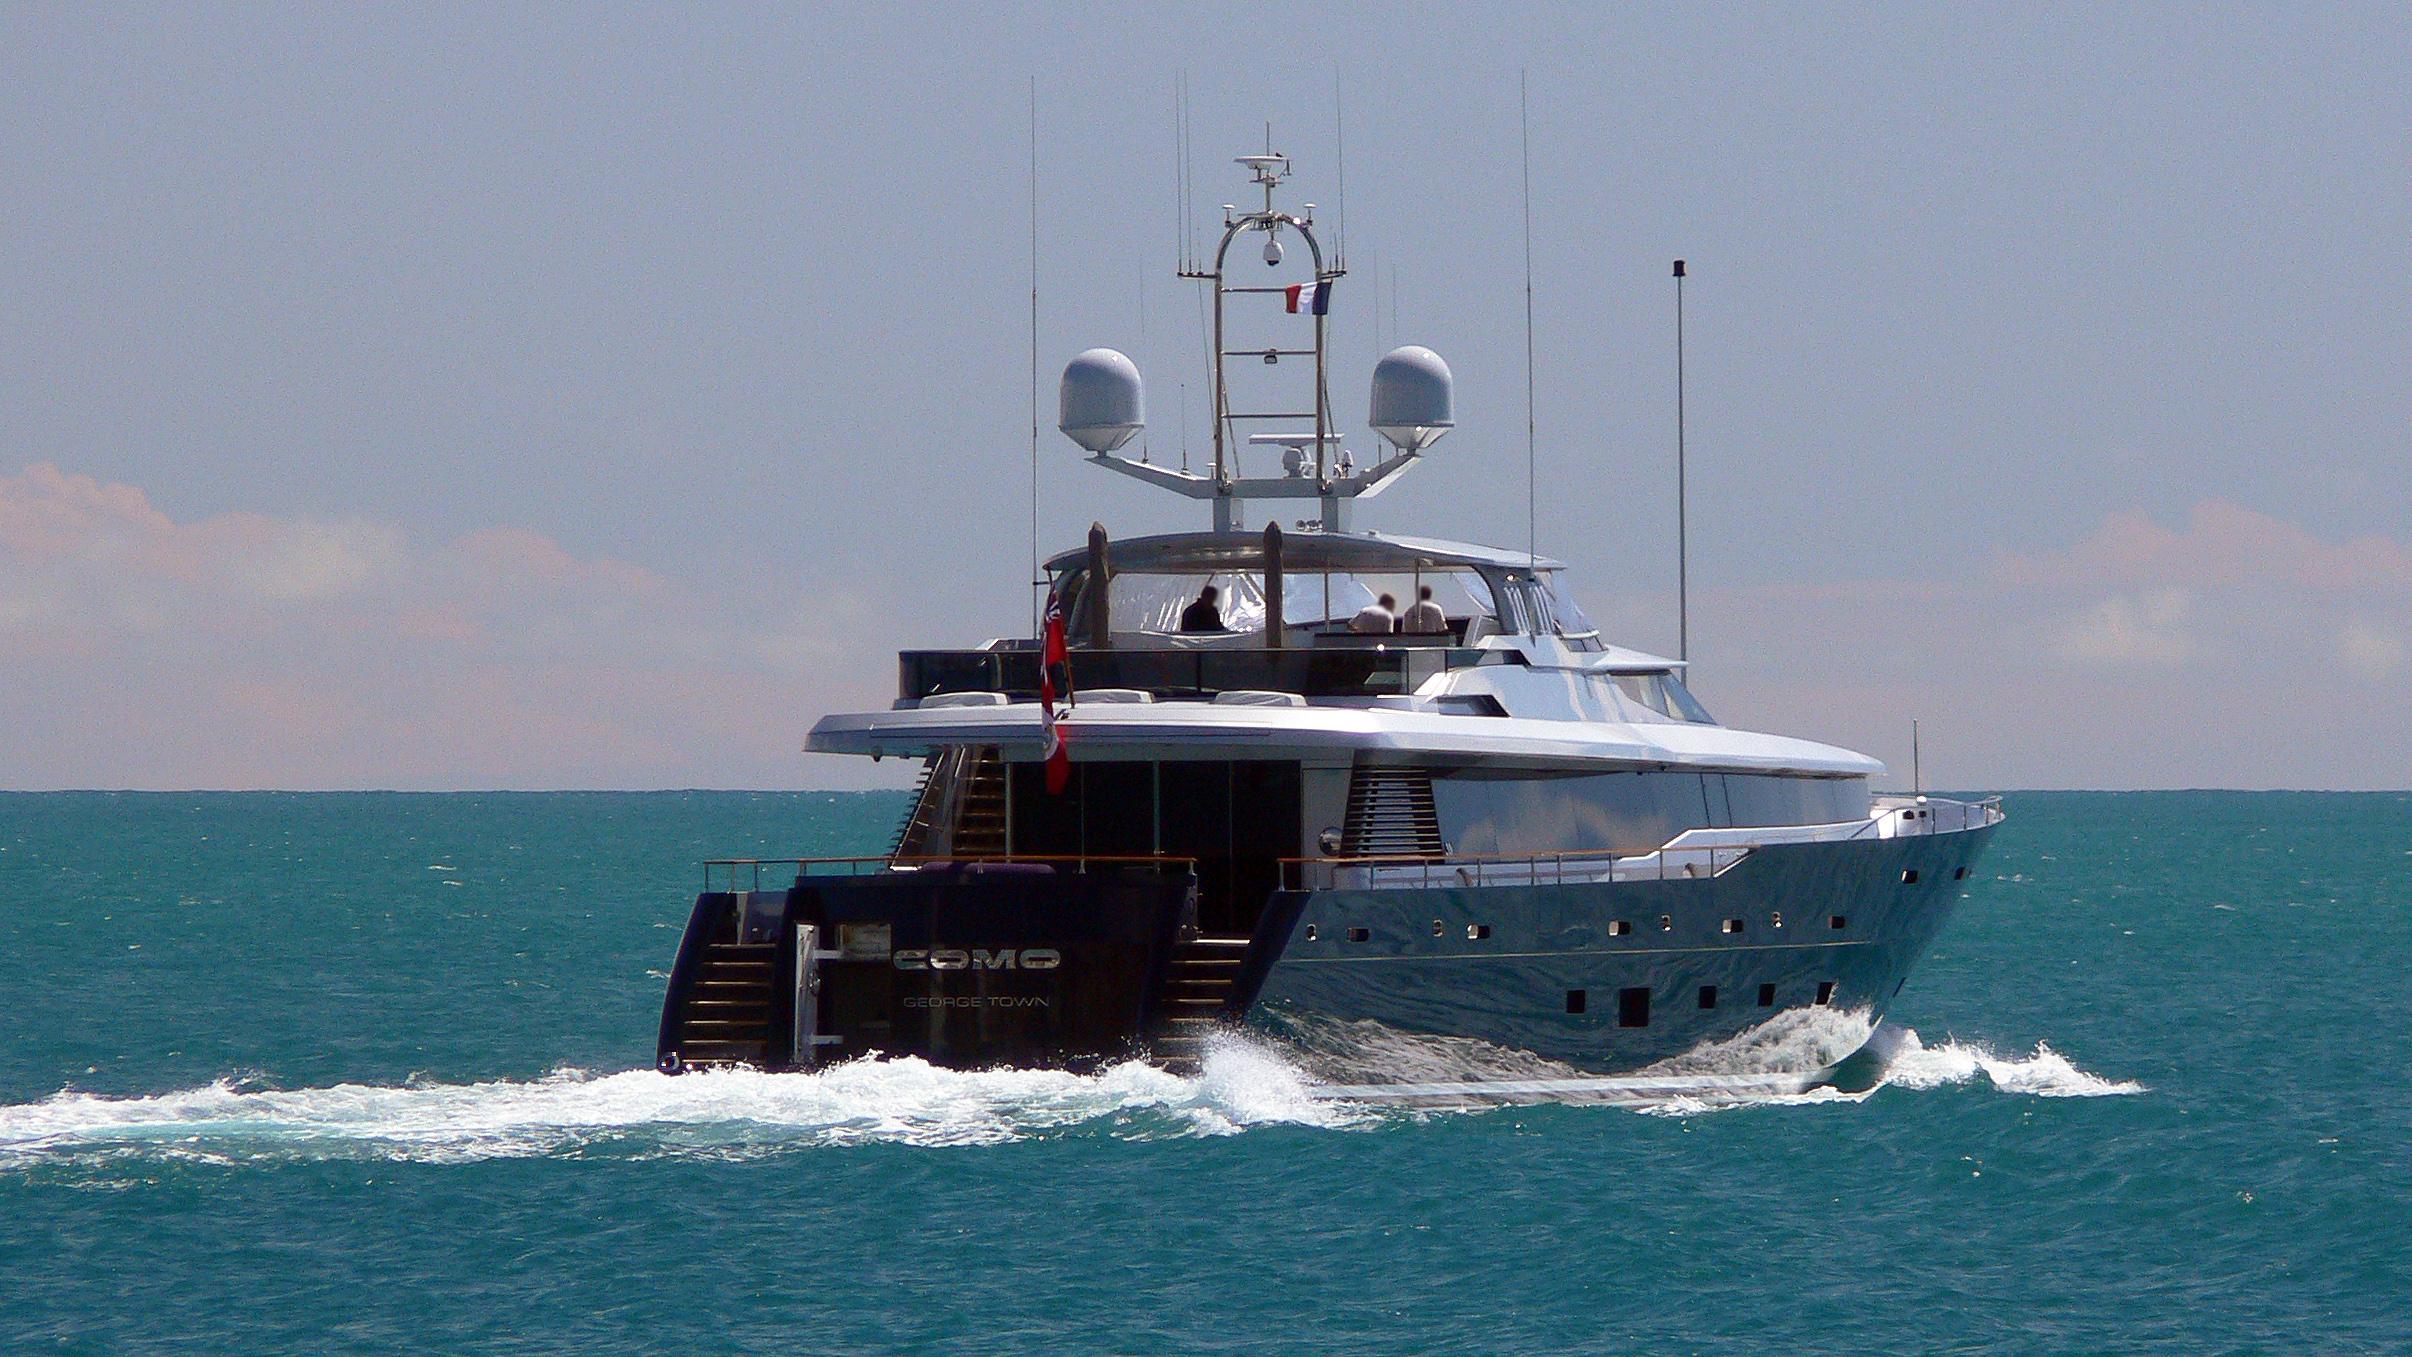 gazelle-polly-motor-yacht-alloy-2007-41m-cruising-stern